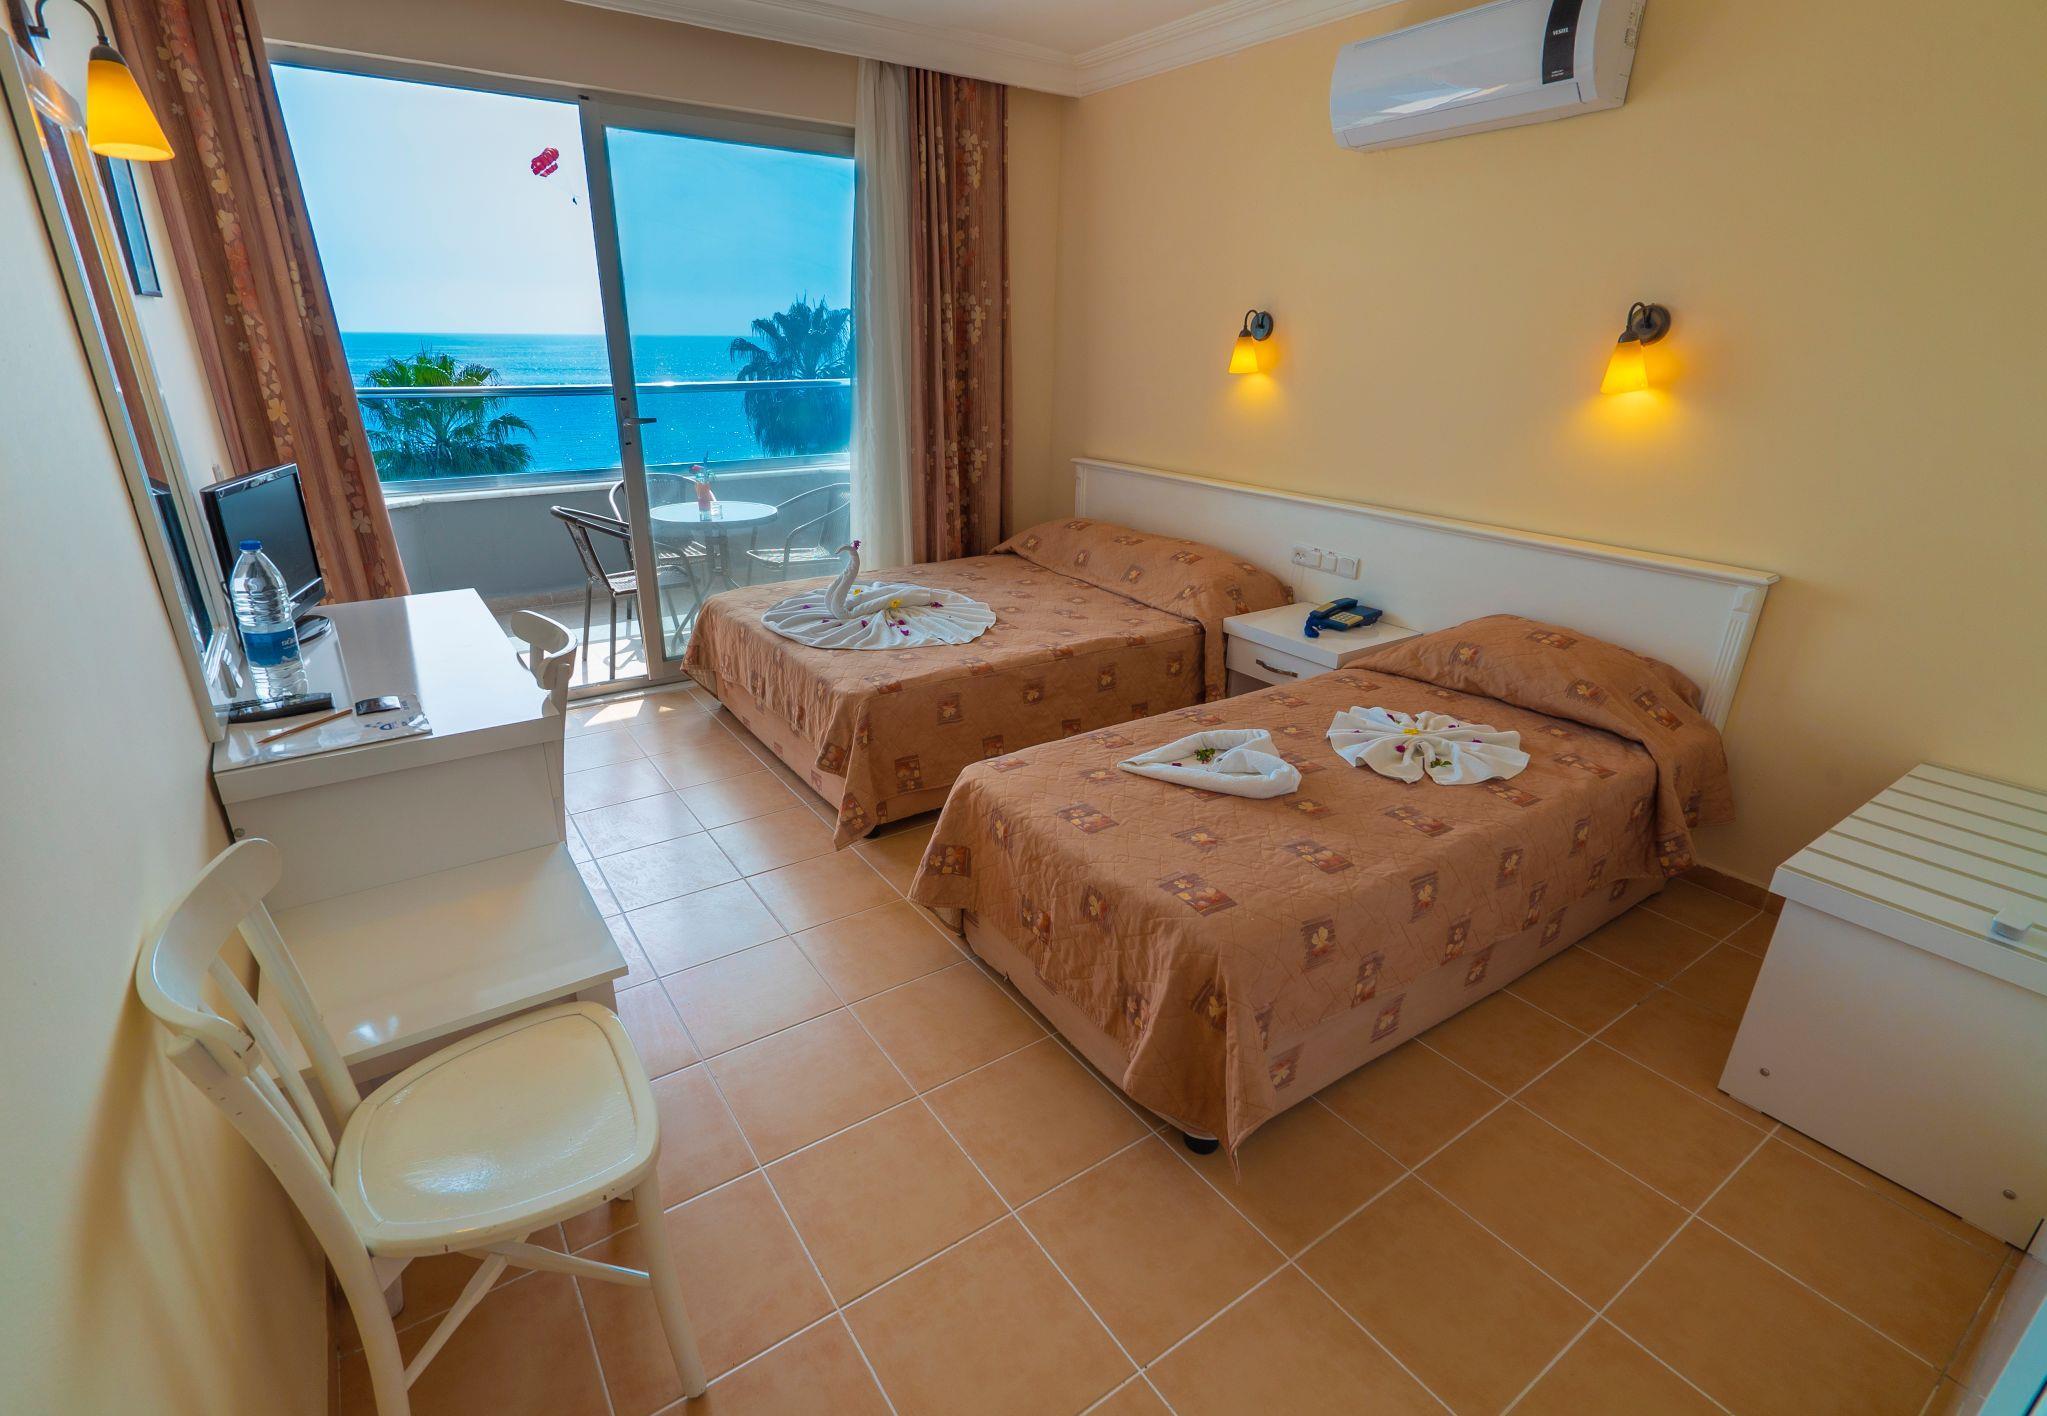 http://www.orextravel.sk/OREX/hotelphotos/azak-beach-general-0020.jpg